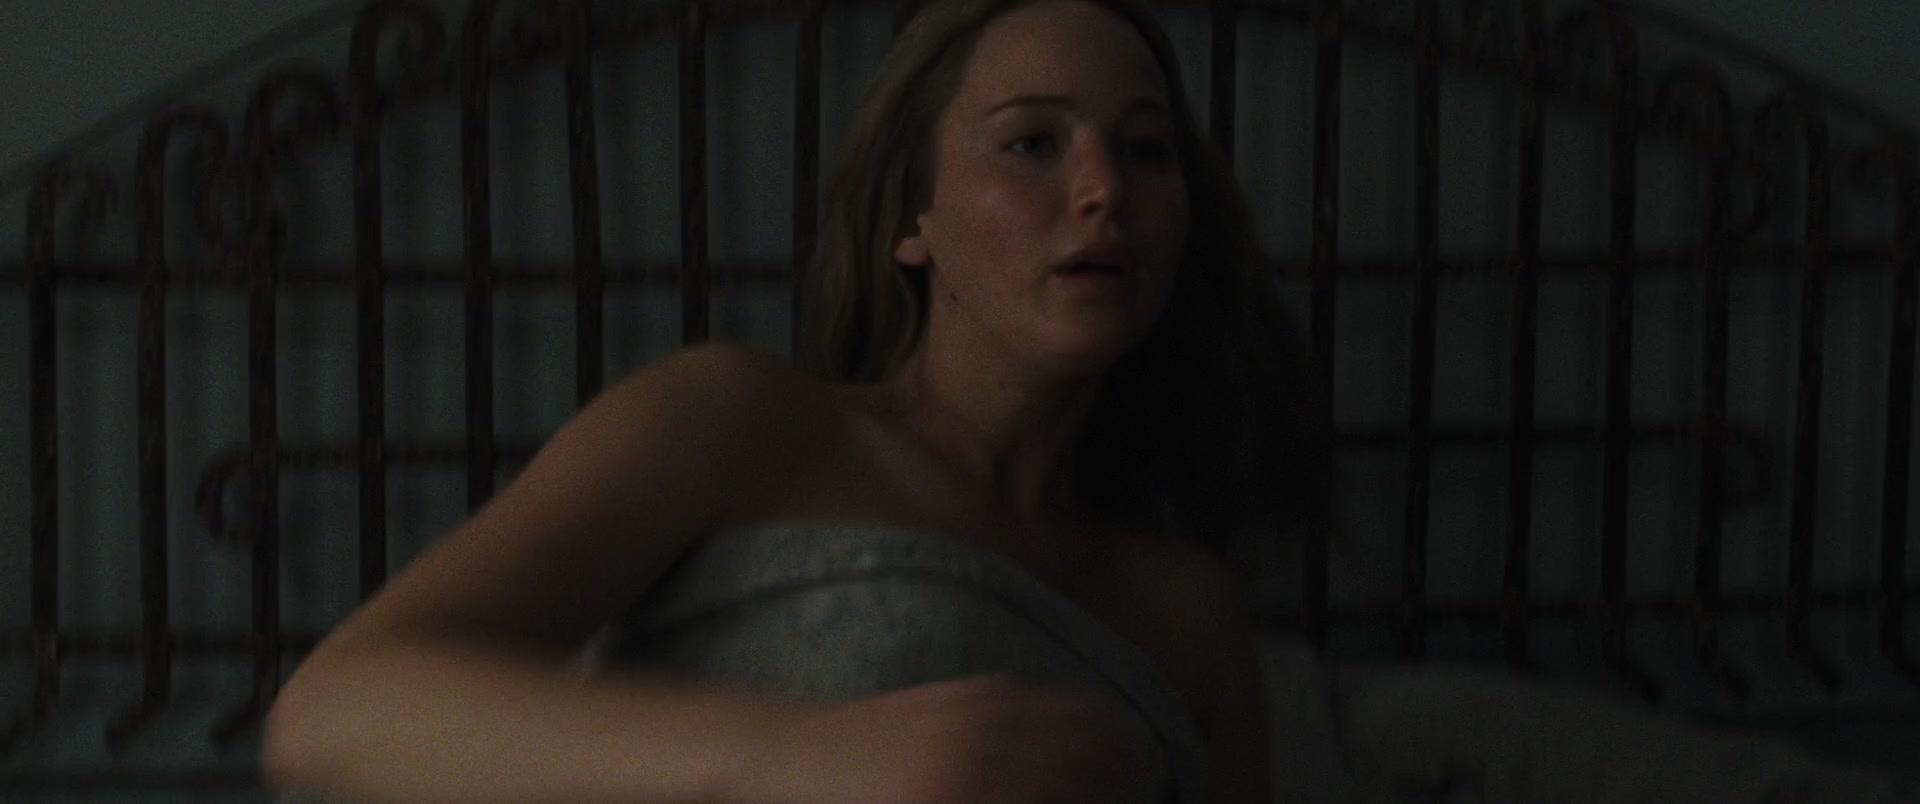 Jennifer-Lawrence-Michelle-Pfeiffer-Mother-31-thefappeningblog.com_.jpg